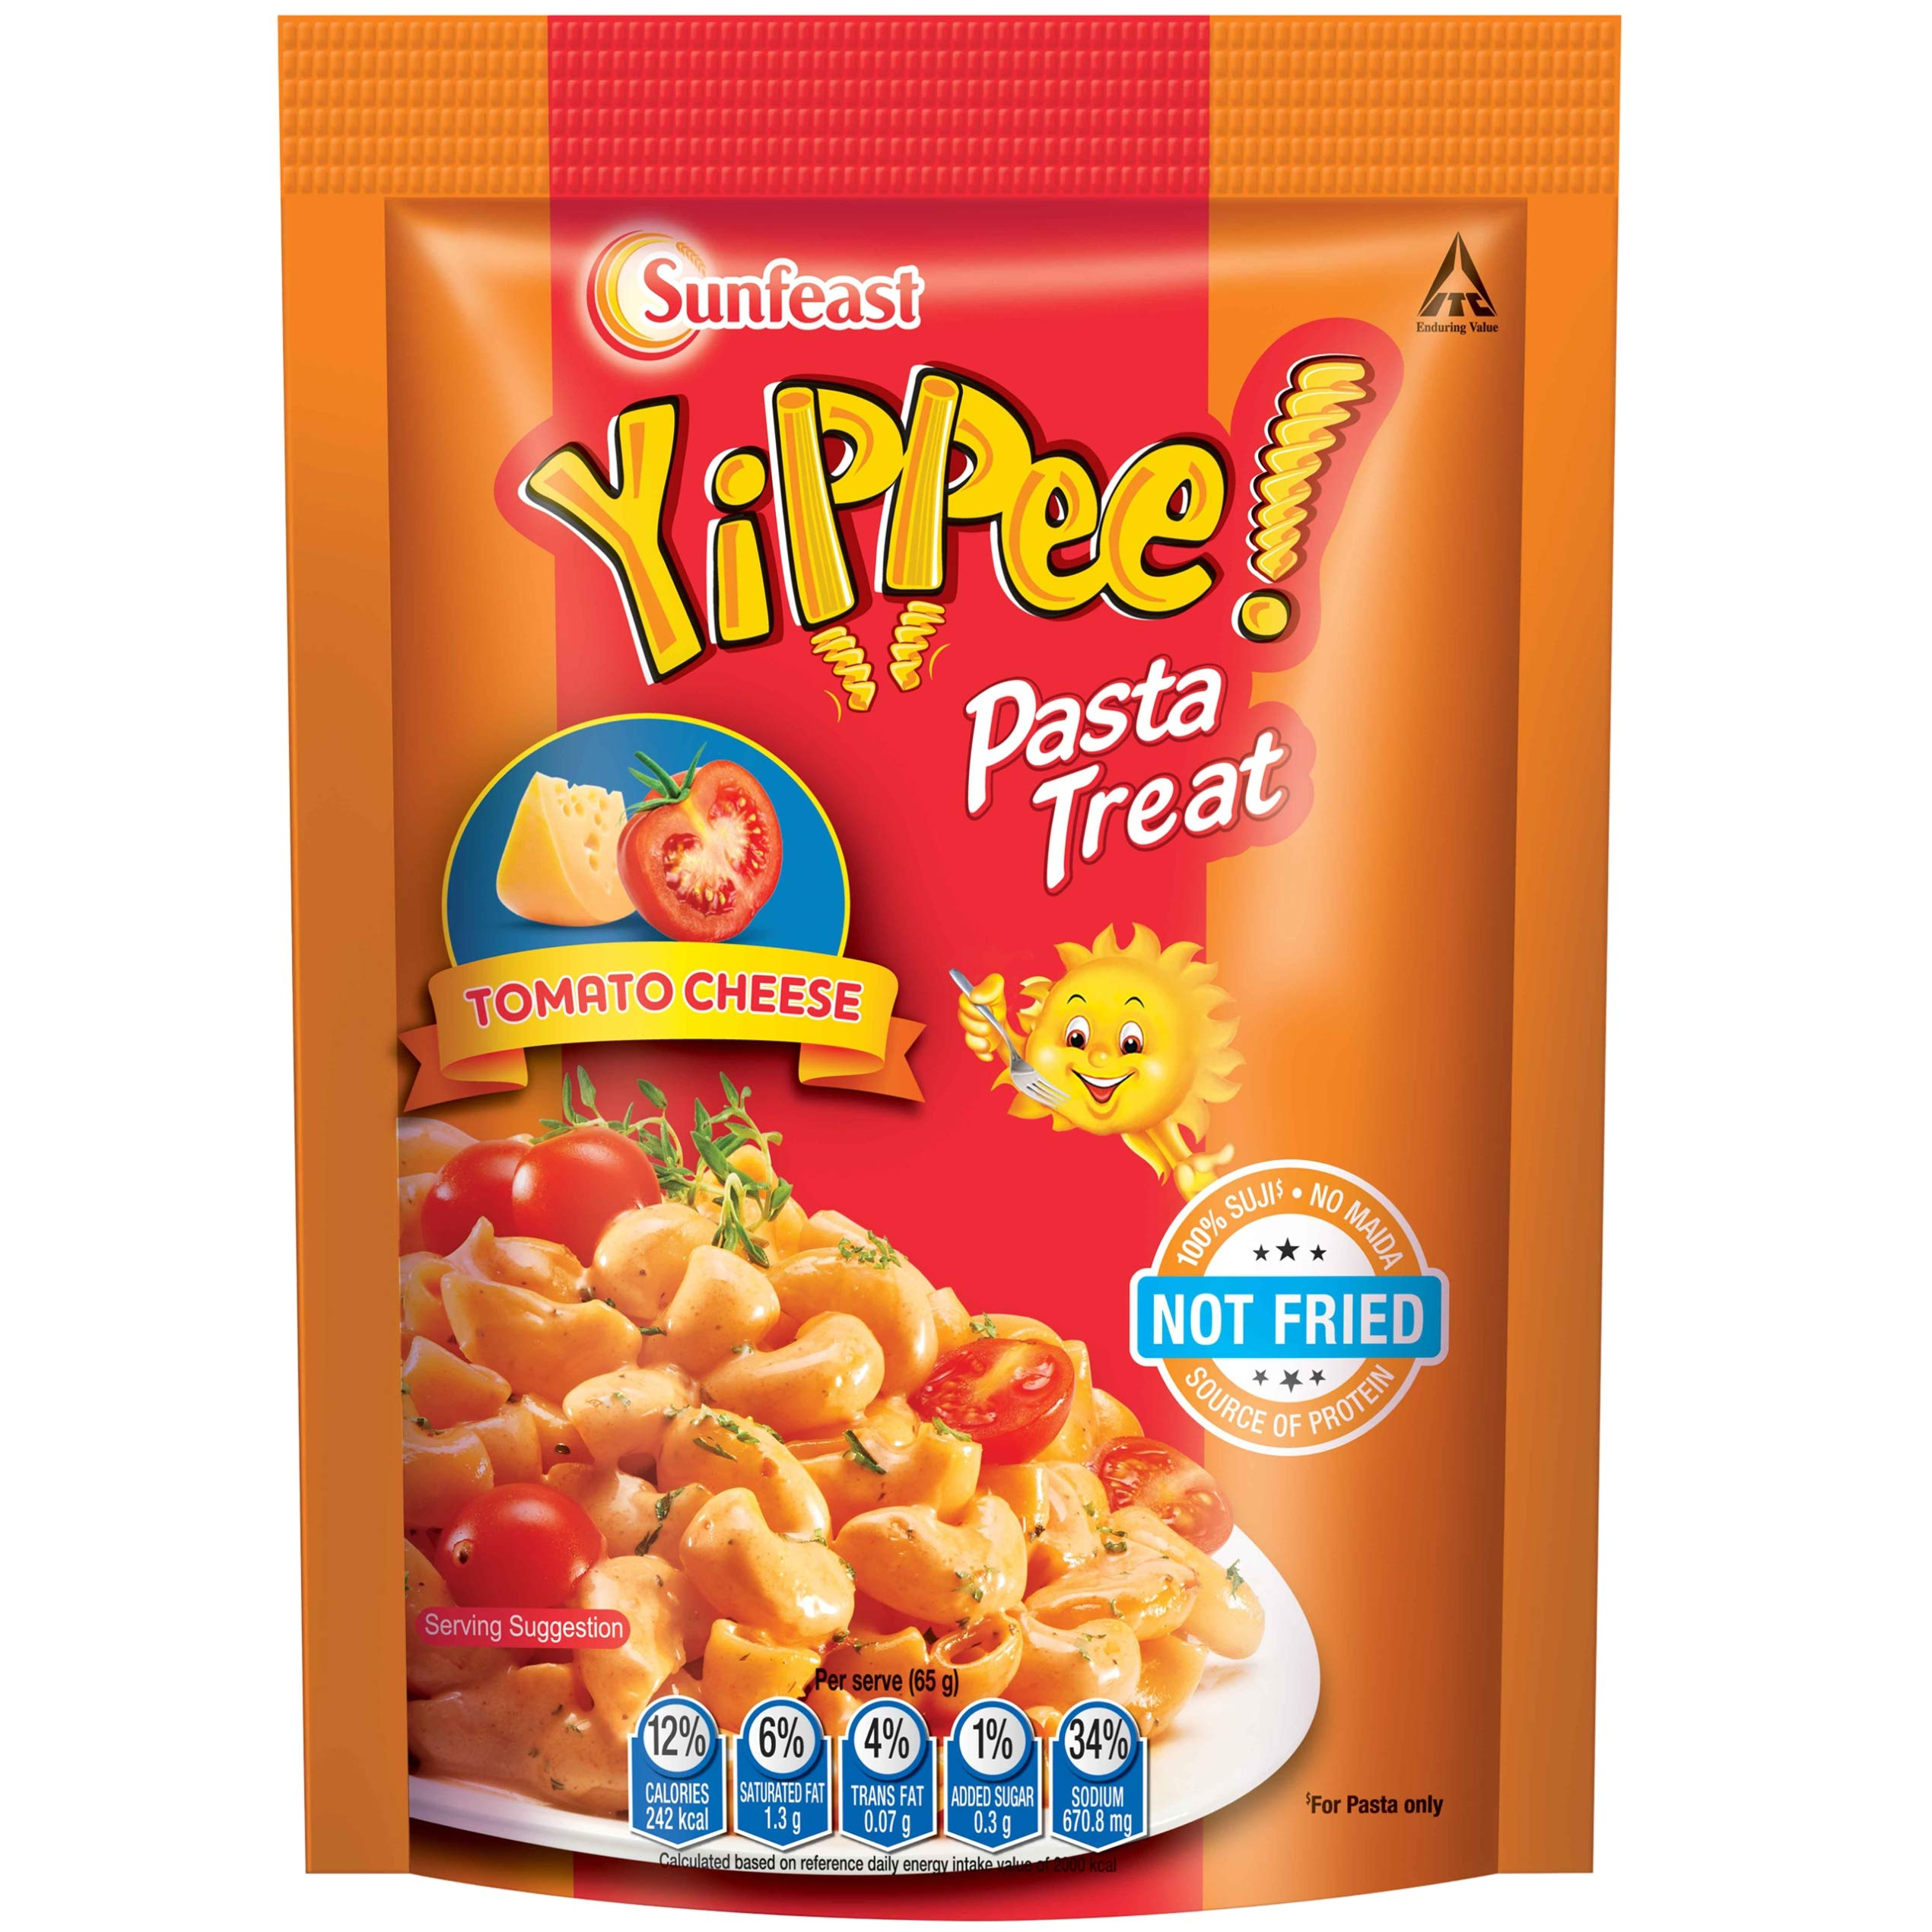 Sunfeast YiPPee! Pasta Treat Tomato Cheese | 65g pack